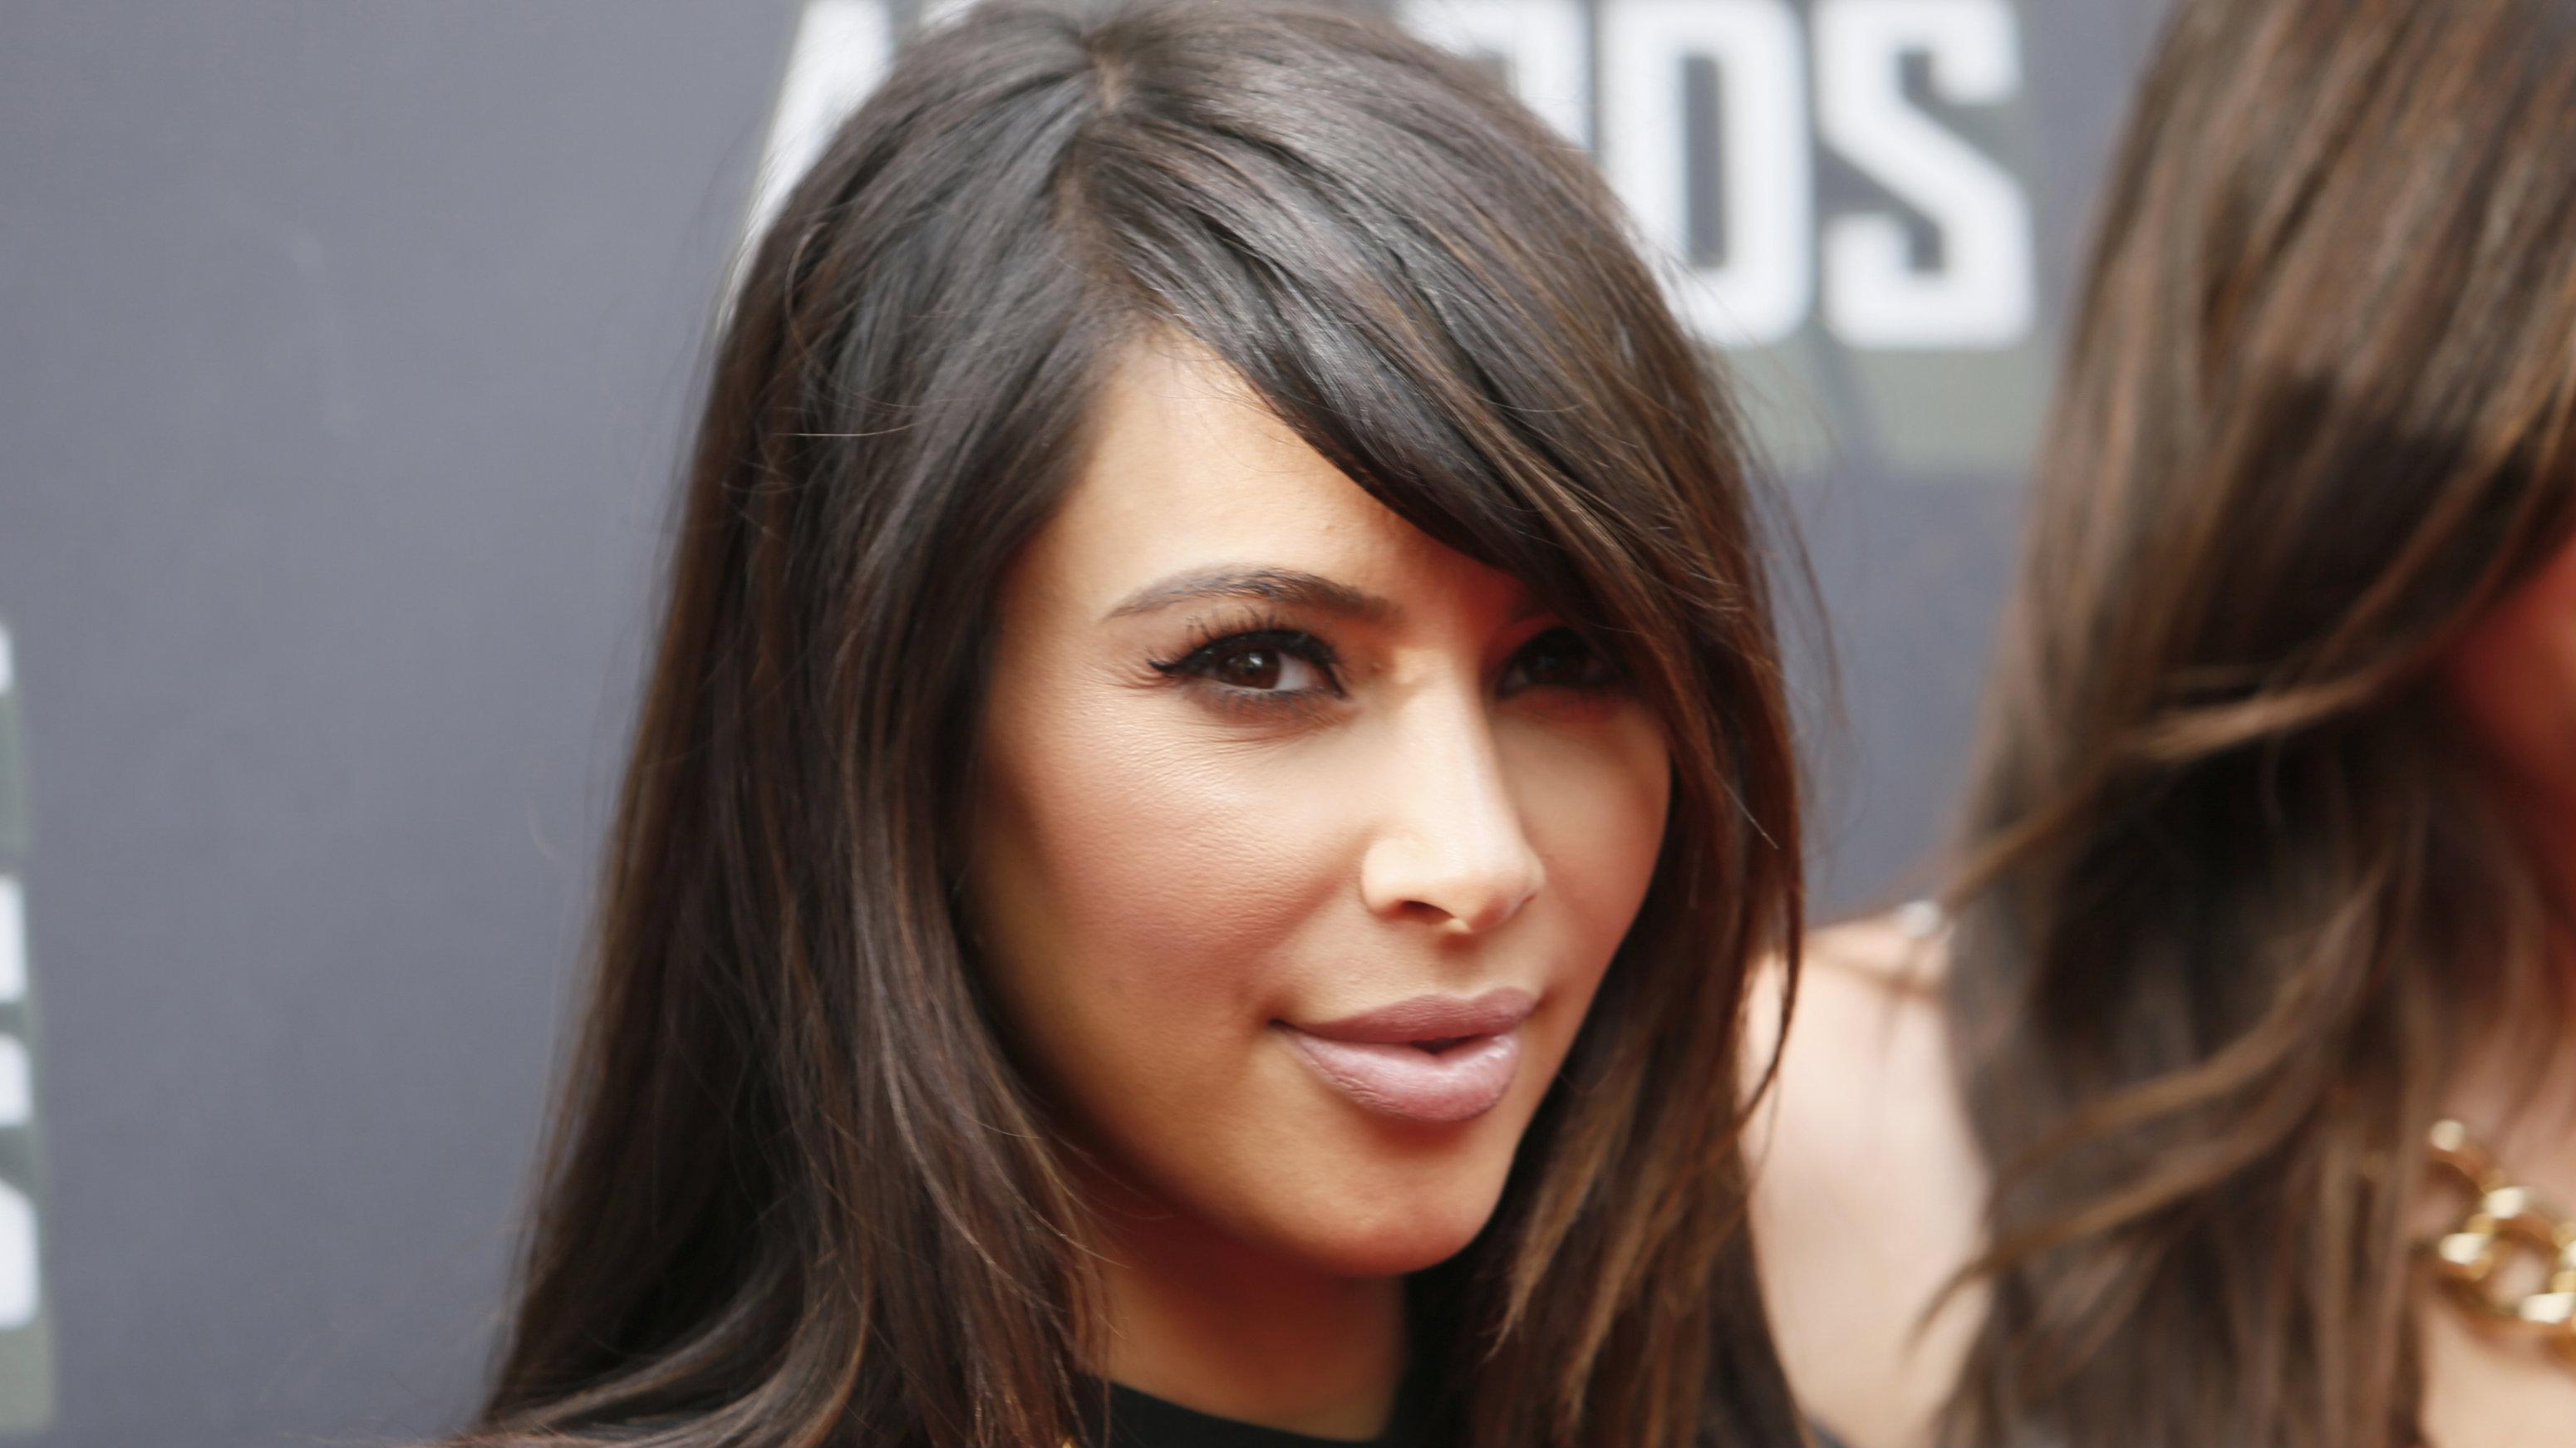 Kim Kardashian arrives at the Teen Choice Awards 2014 in Los Angeles, California August 10, 2014.